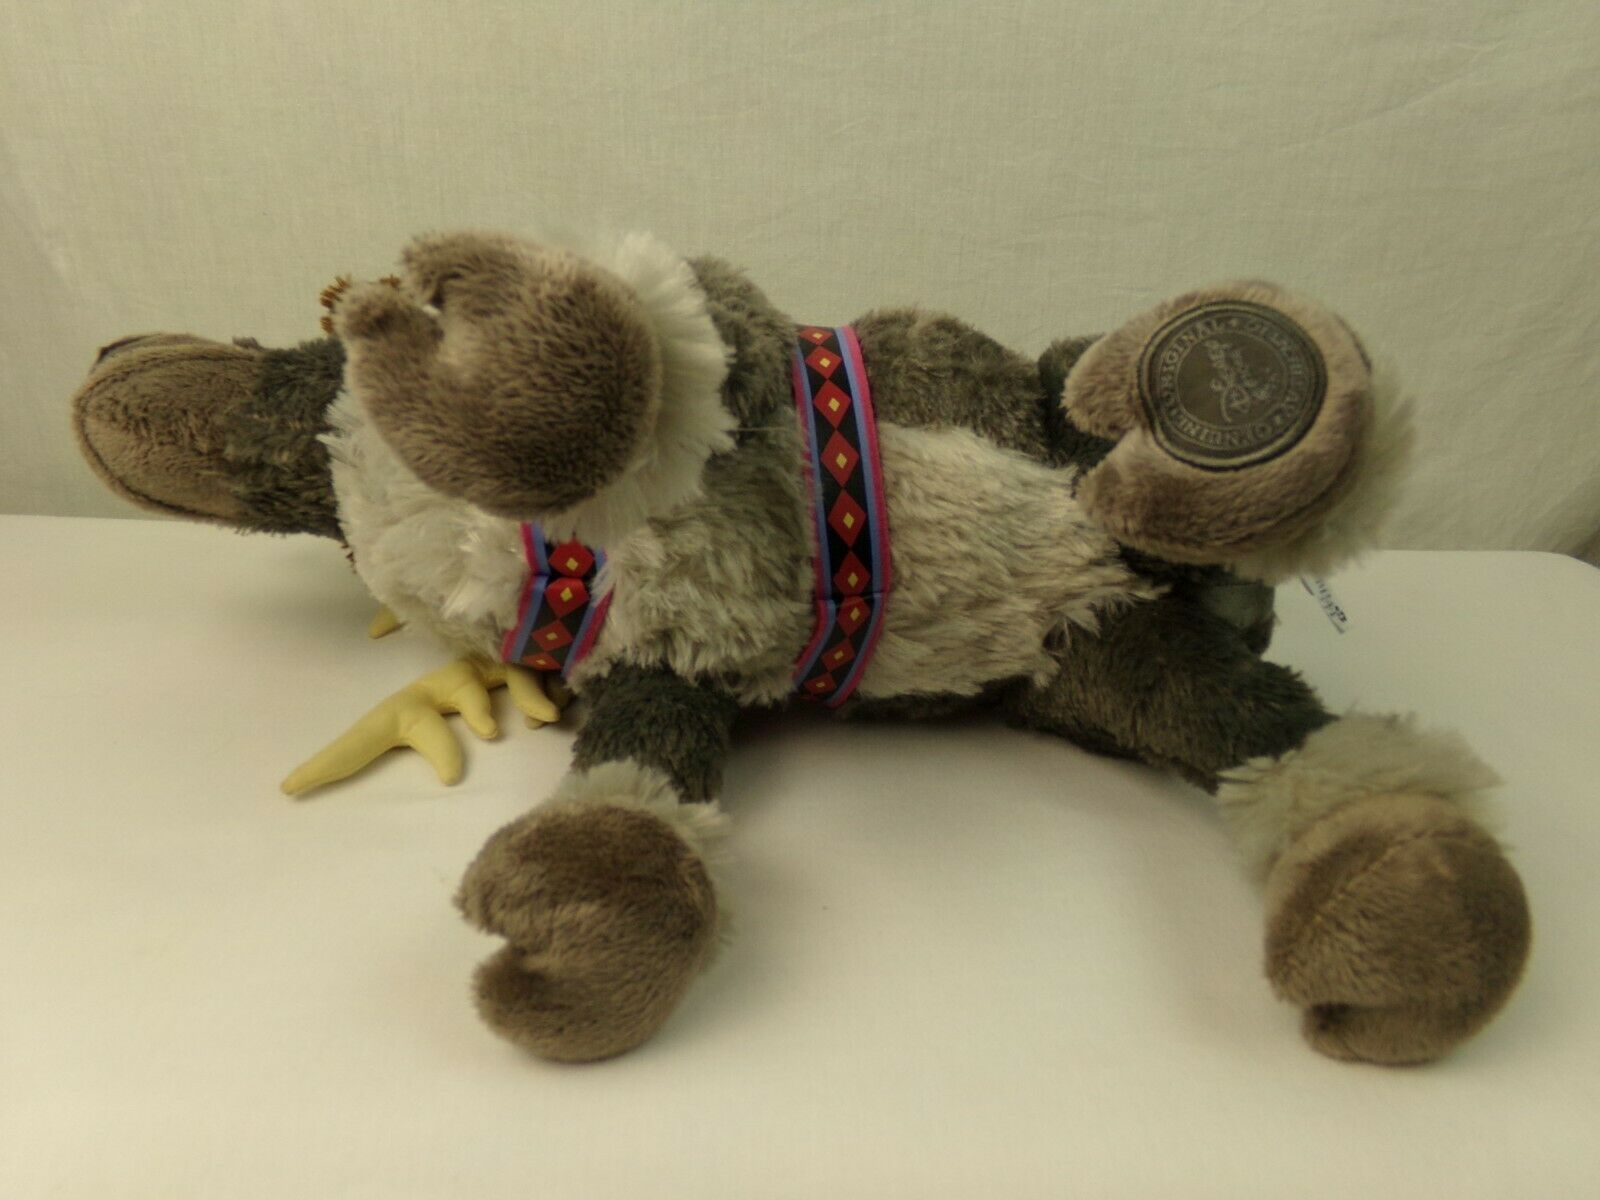 "Disney Store Frozen Sven Reindeer 16"" Plush Stuffed Animal Poseable"